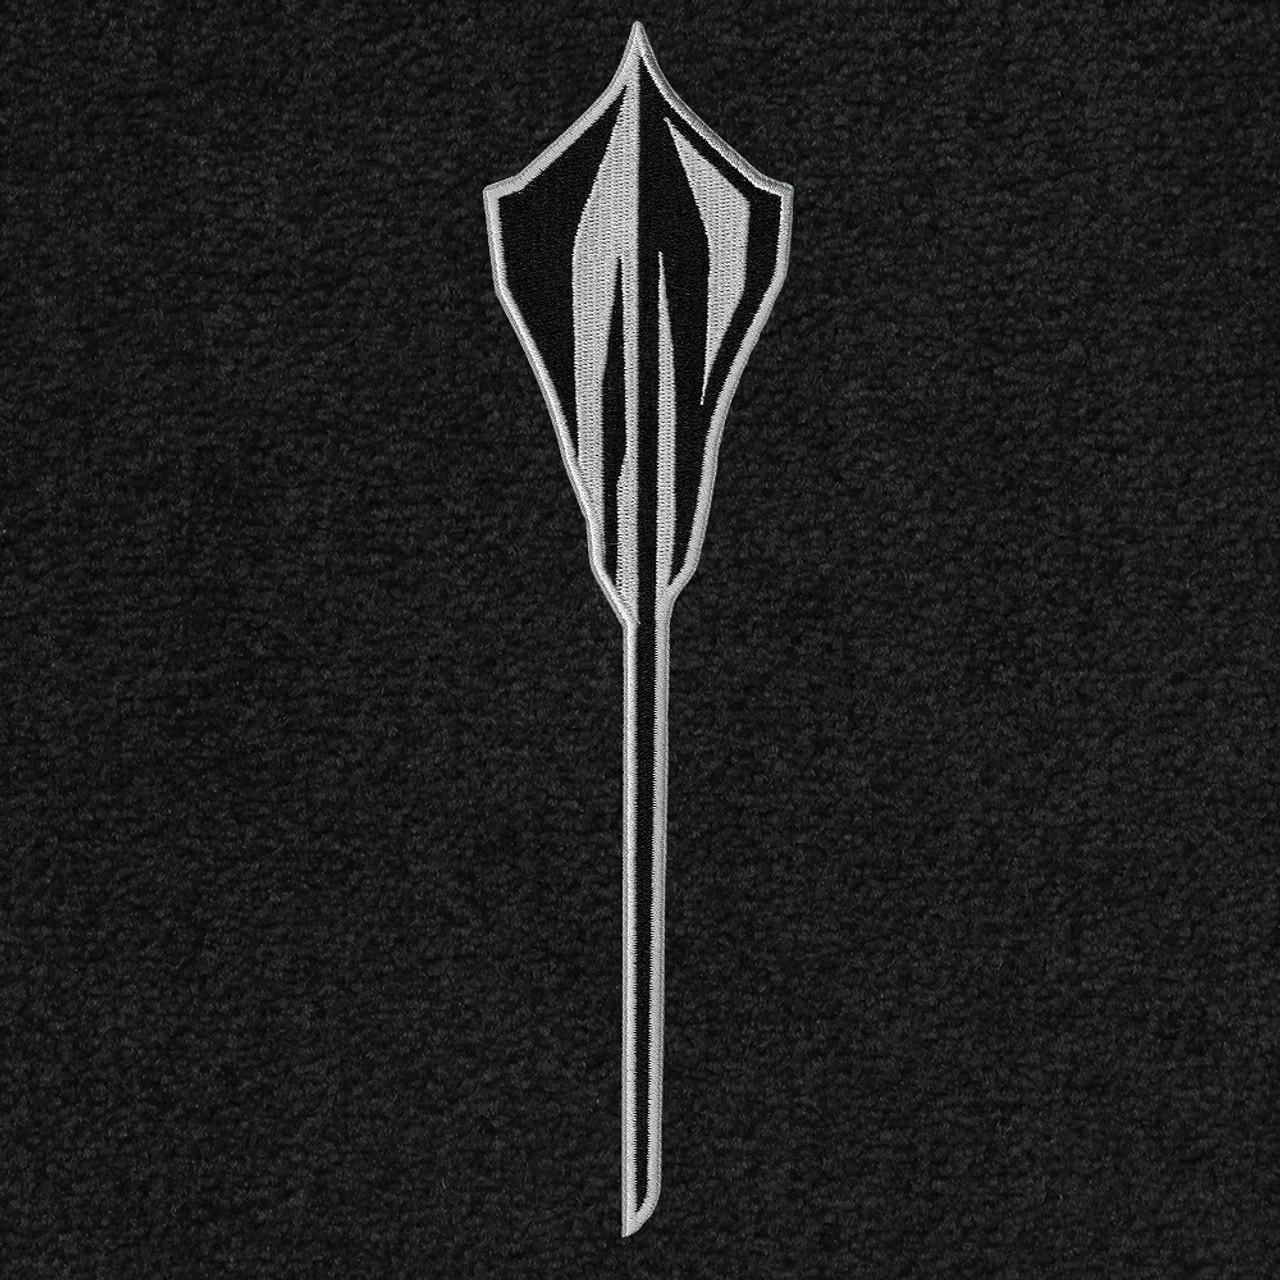 819403 - Vertical Stingray Fish Logo